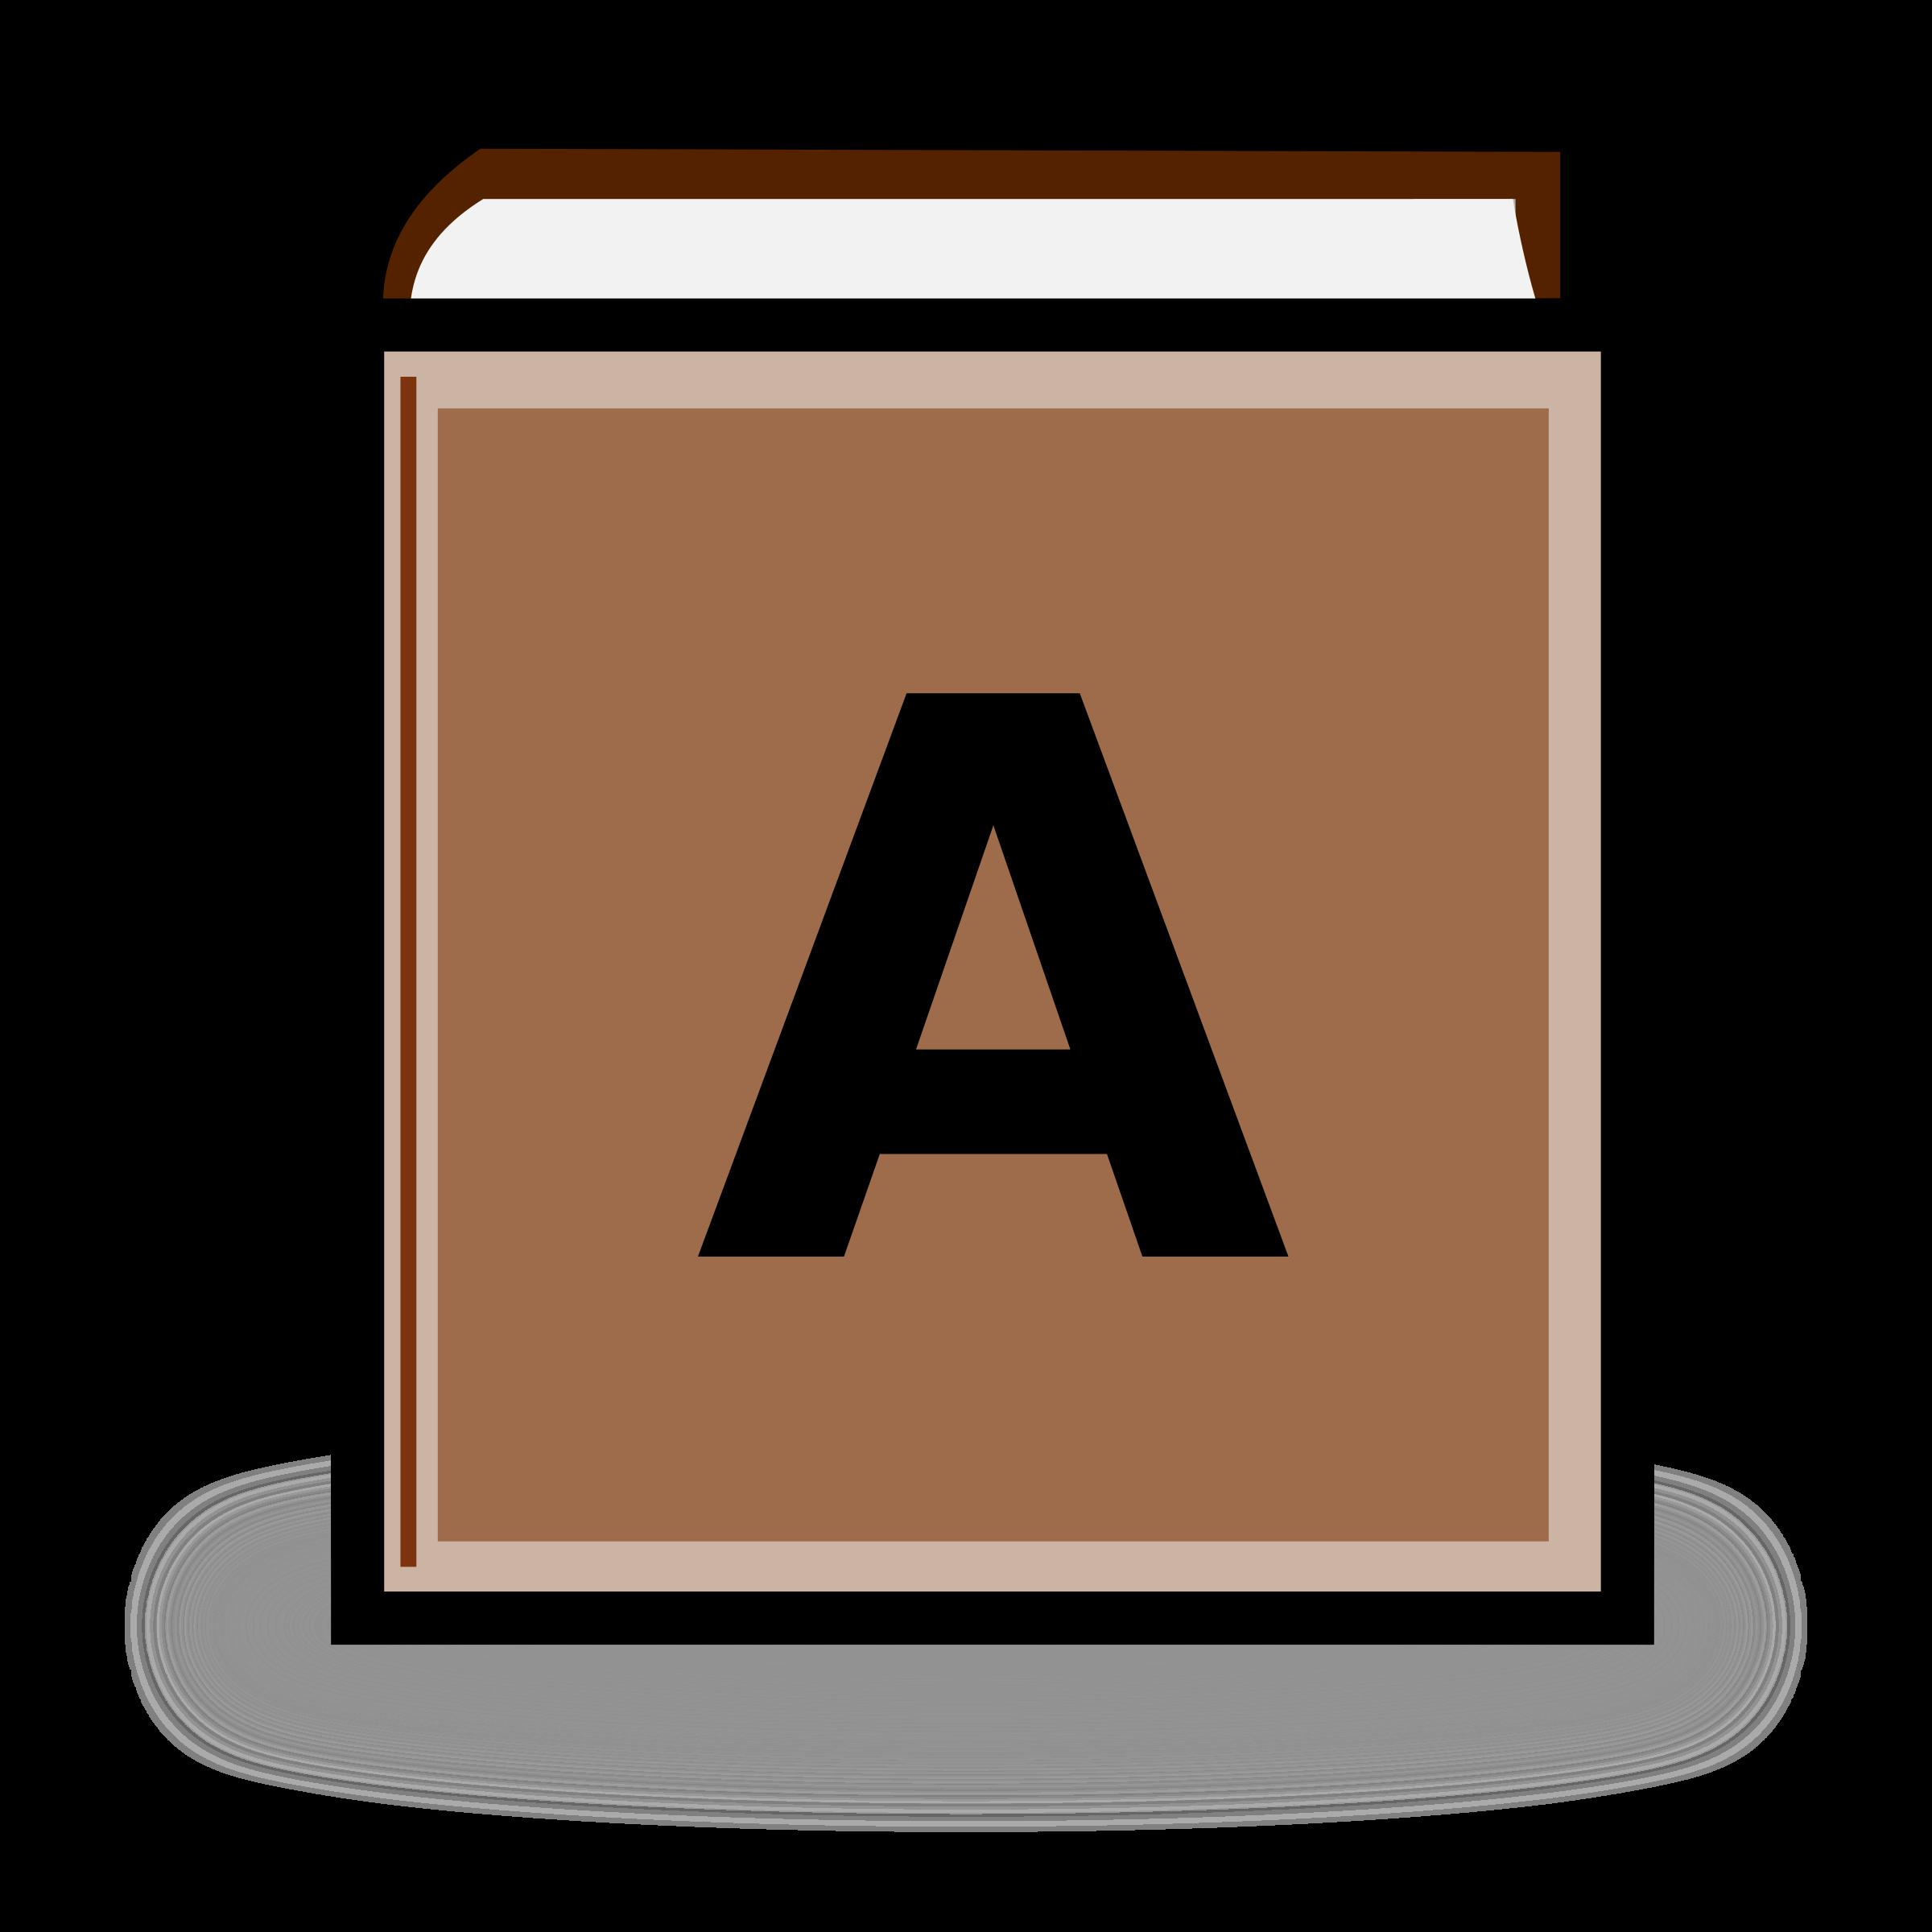 dictionary clipart manual